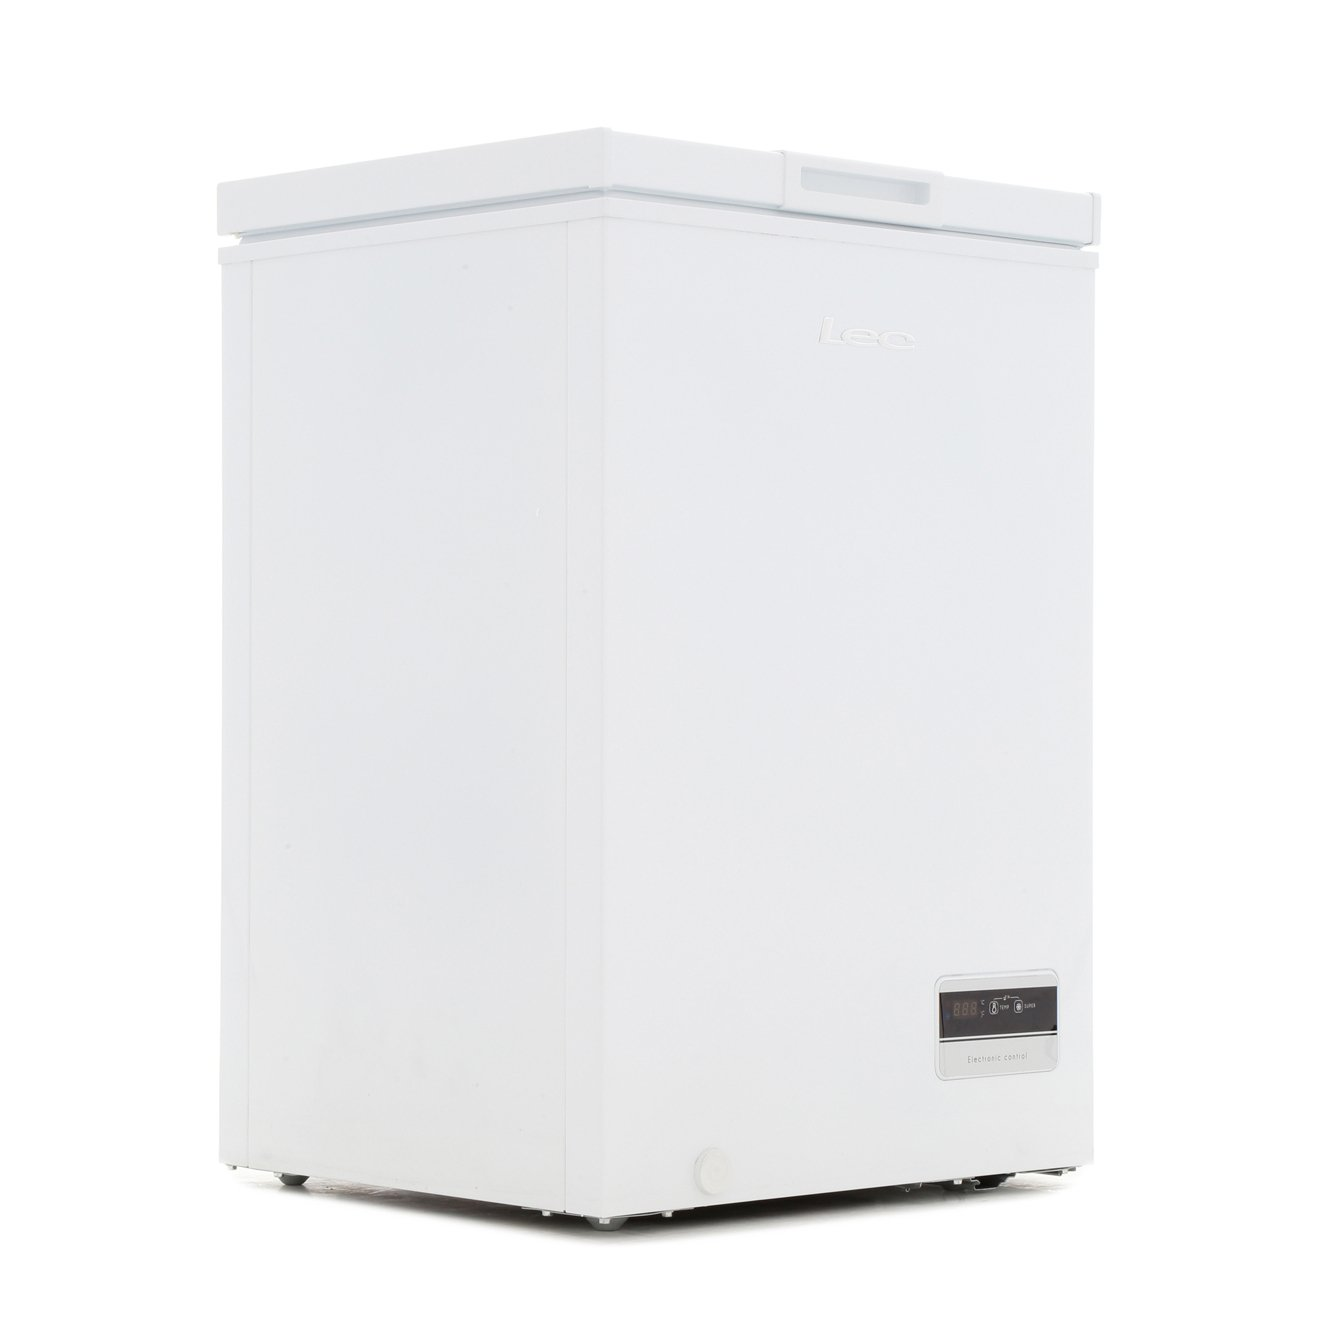 Lec CF100L Static Chest Freezer